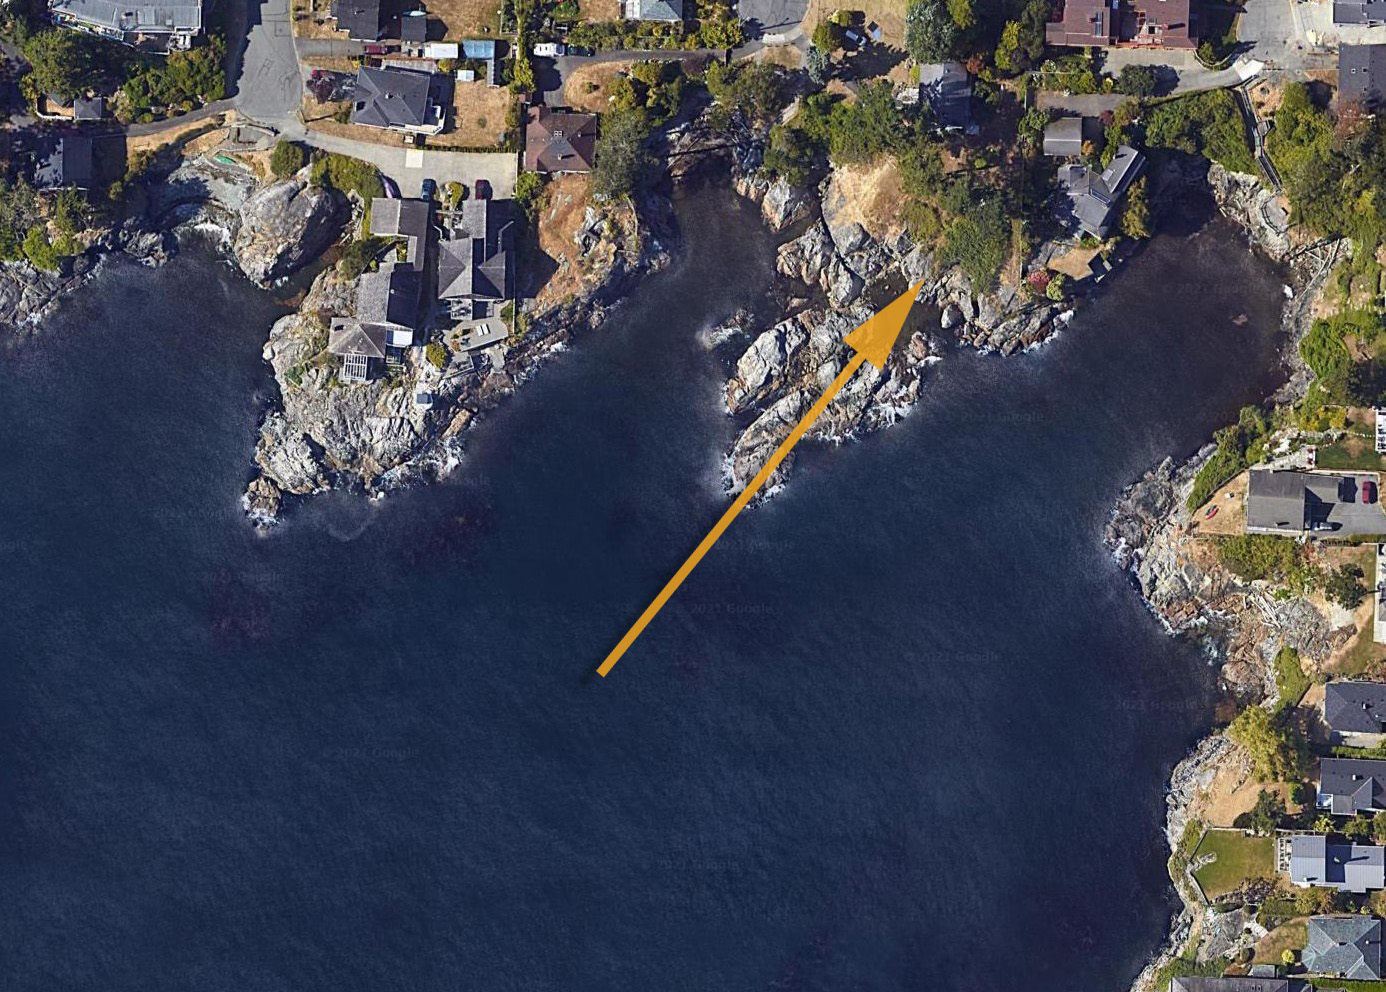 OneSEED_PontoonCoveEcoHouse_17 Google Earth